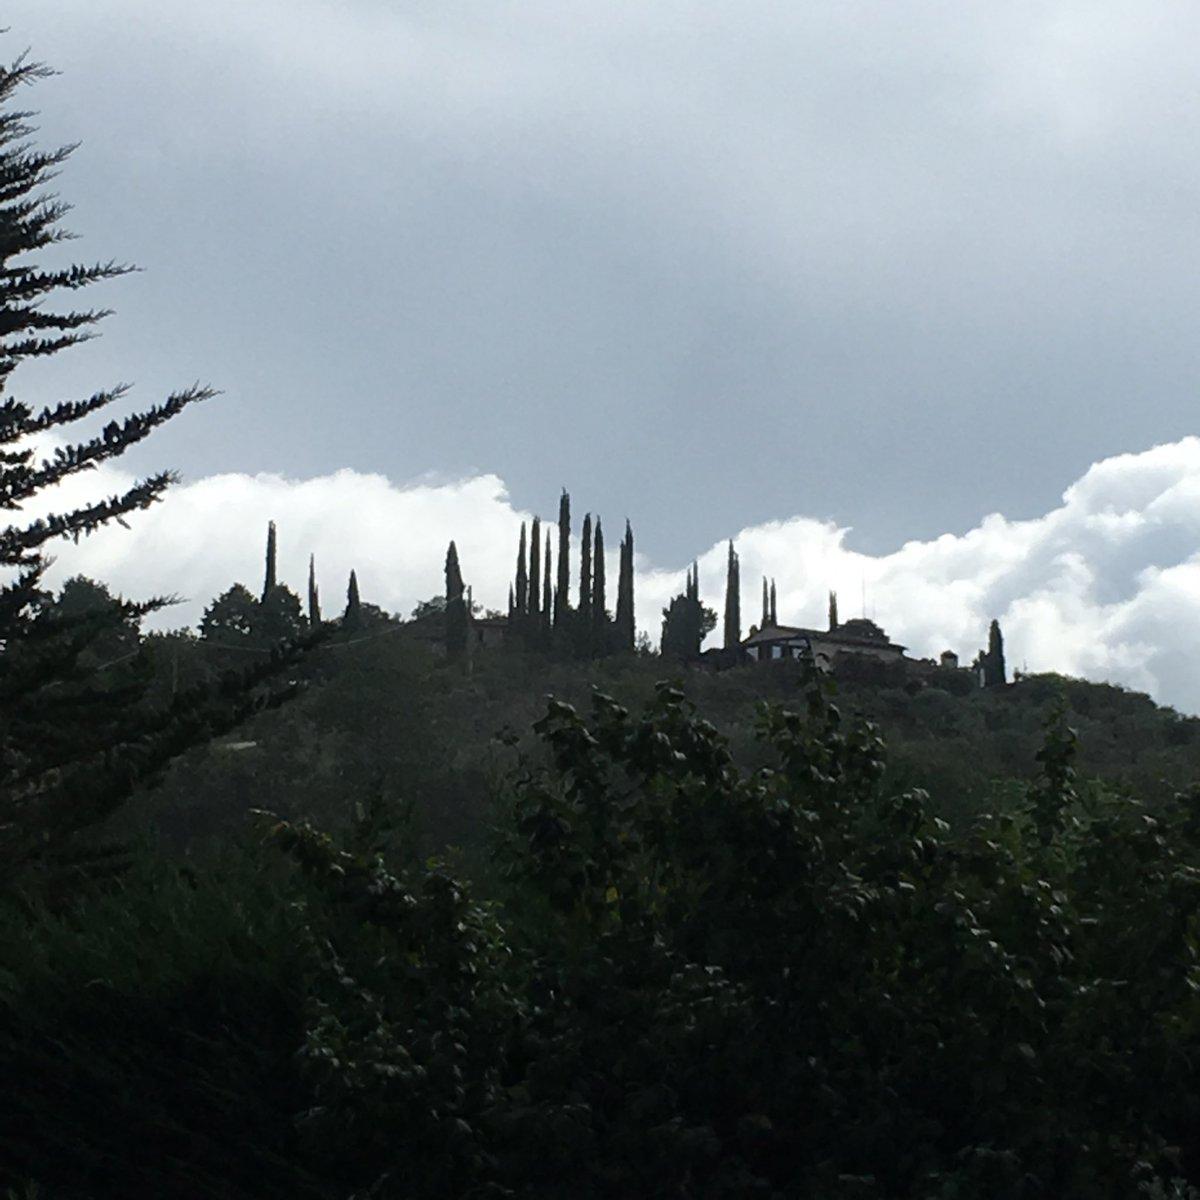 Alan Paul Bush On Twitter Cypress Trees On A Hill